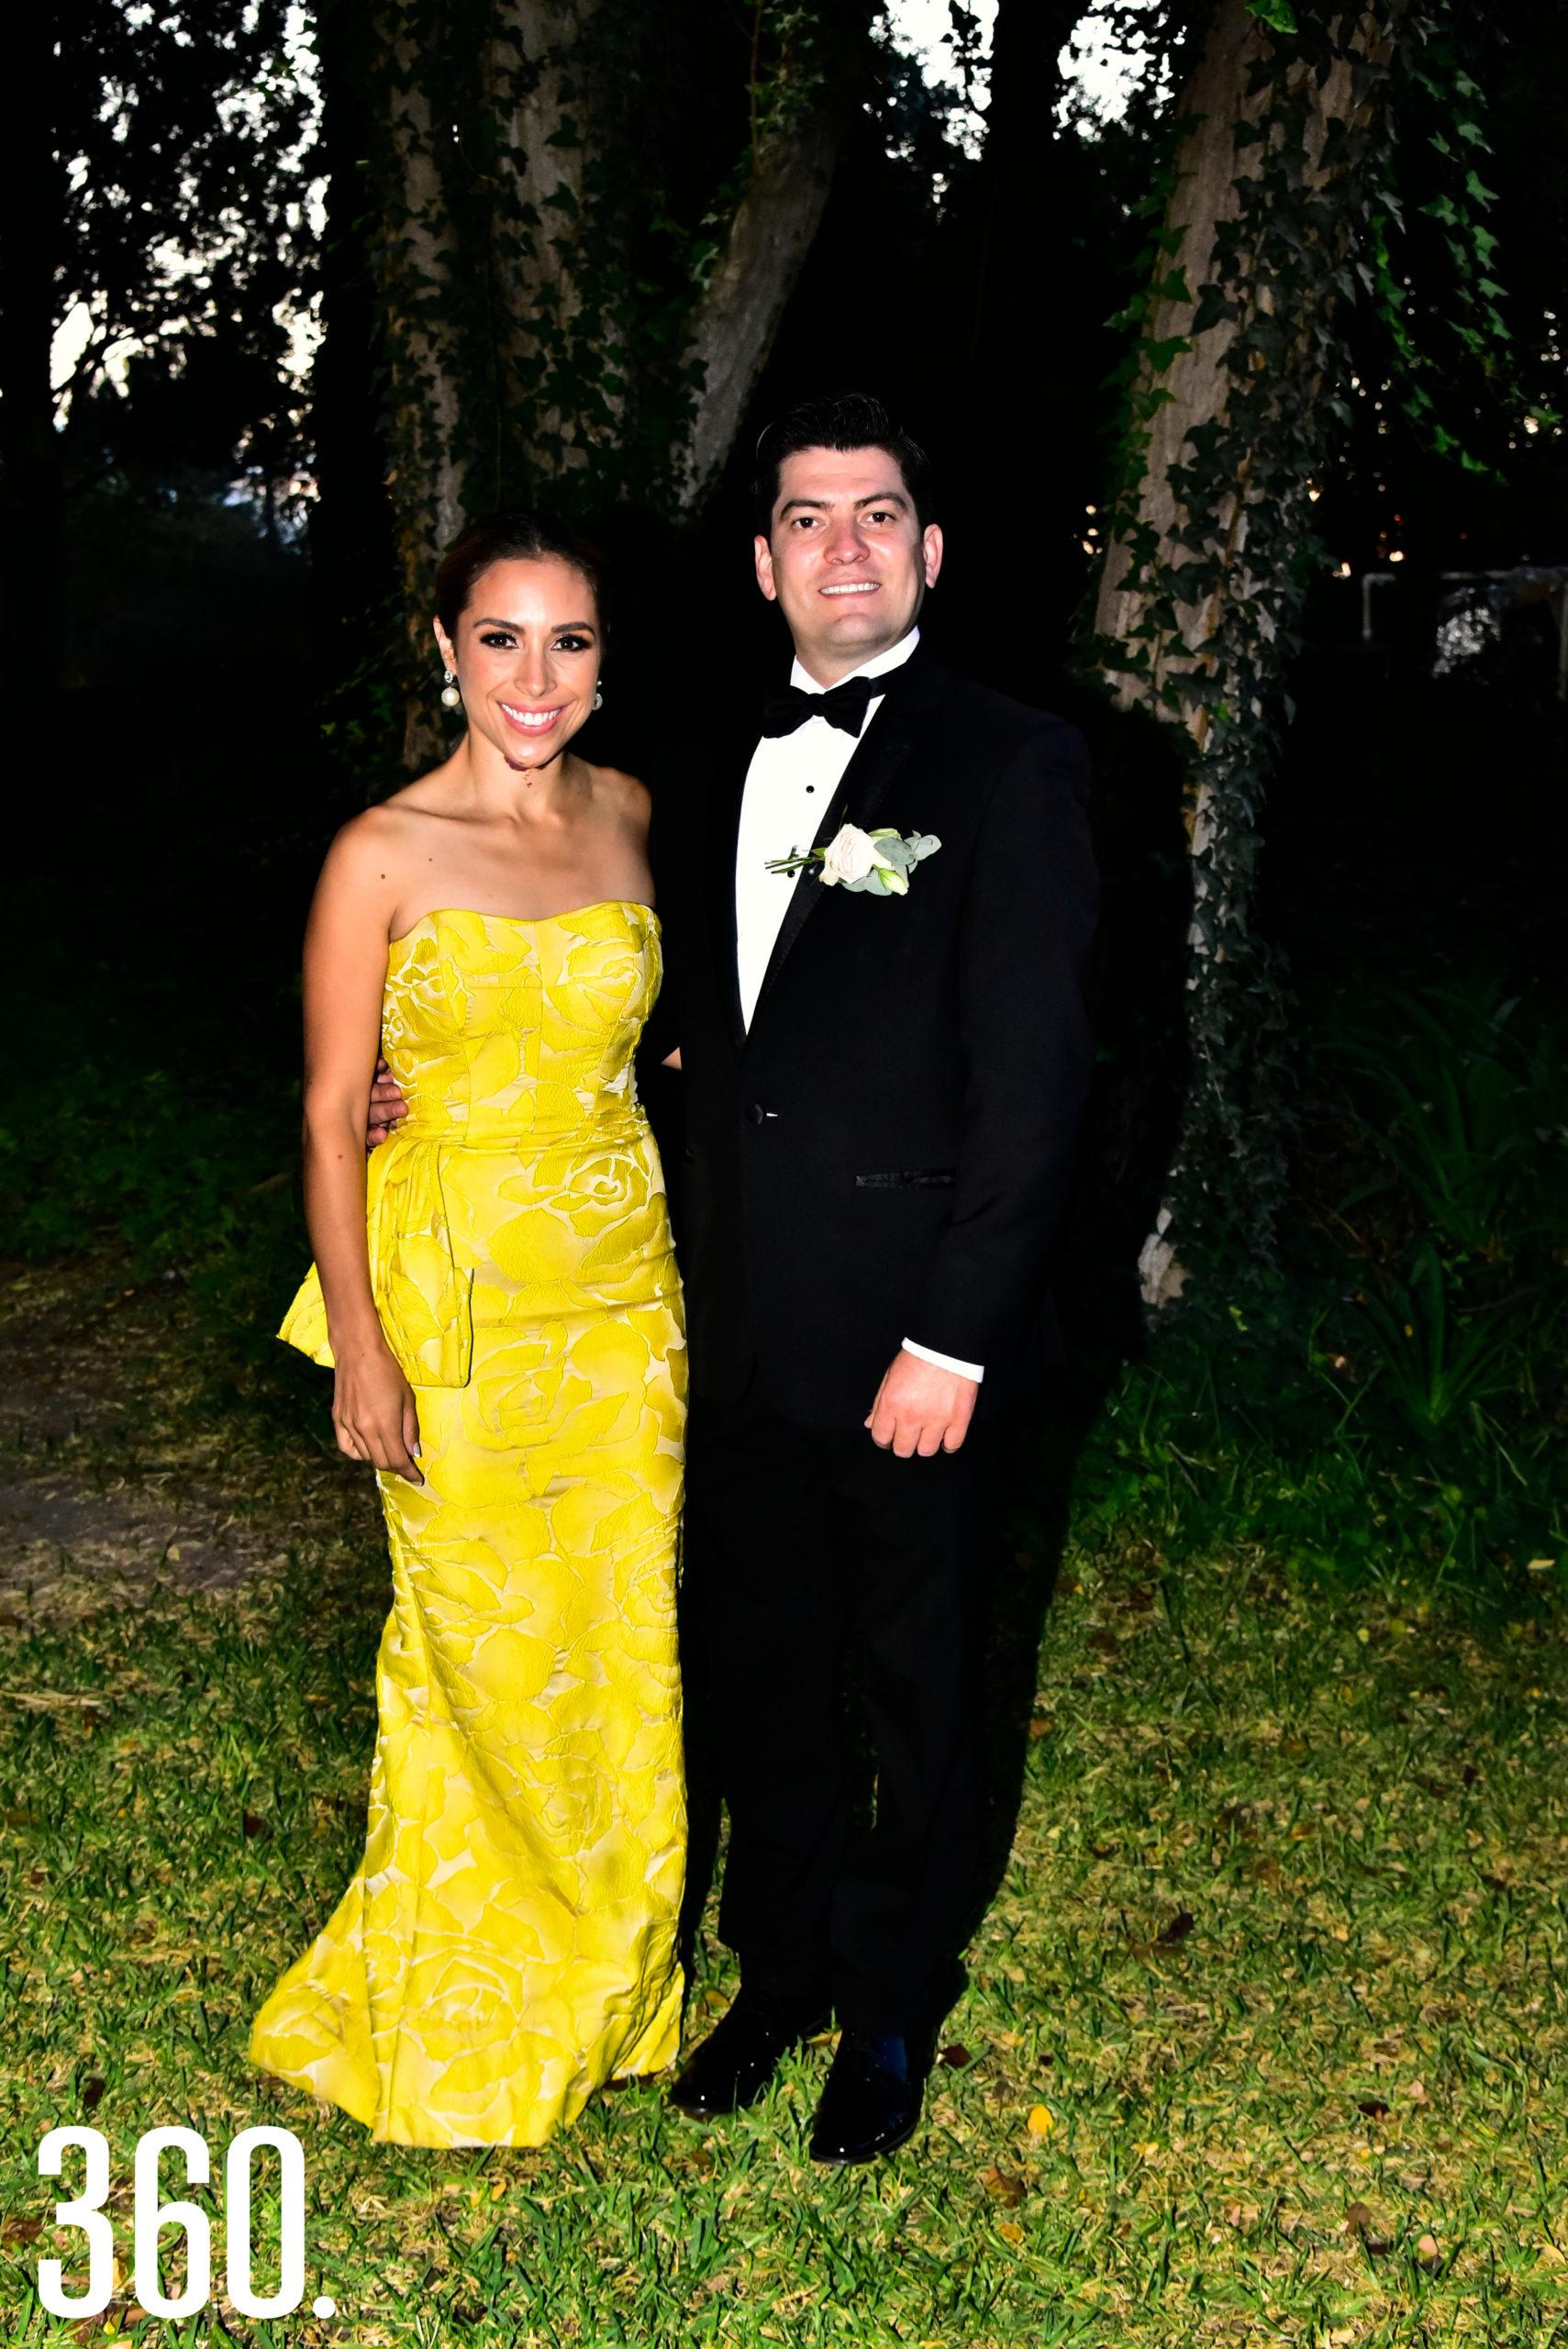 Marielena Molina y Néstor Garza Vara.